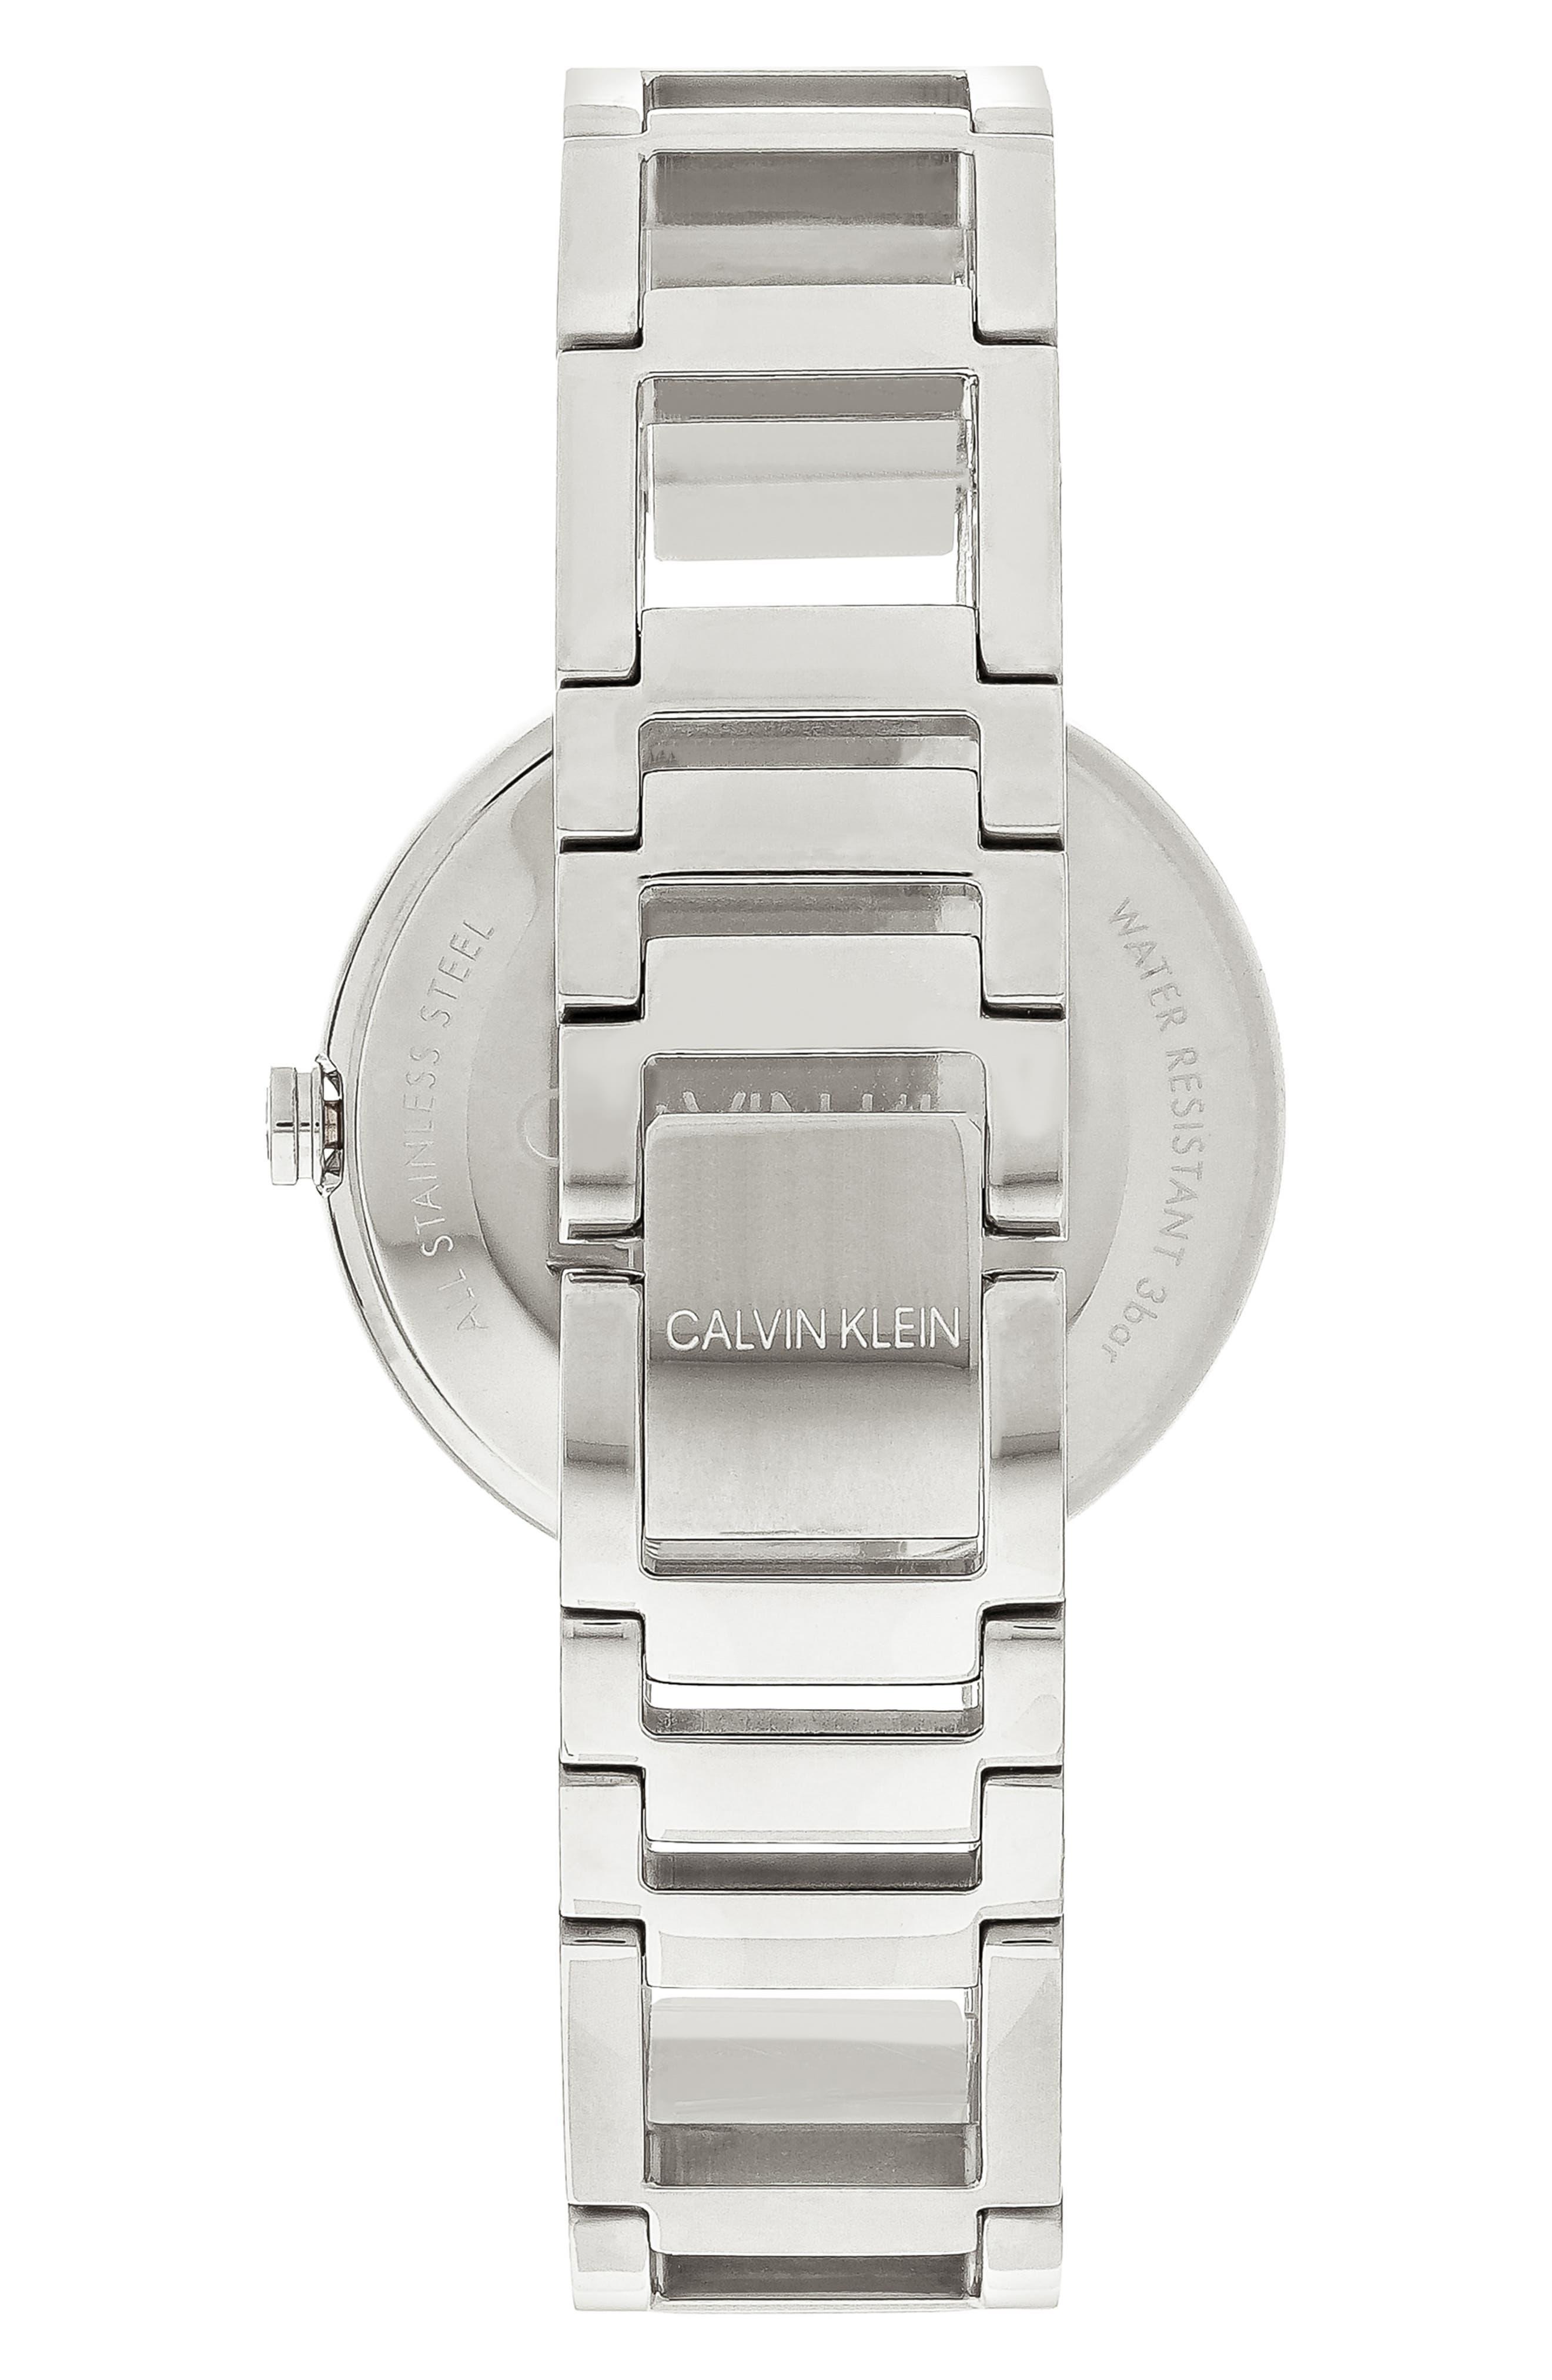 CALVIN KLEIN, Cheers Bracelet Watch, 32mm, Alternate thumbnail 2, color, SILVER/ BLACK/ SILVER